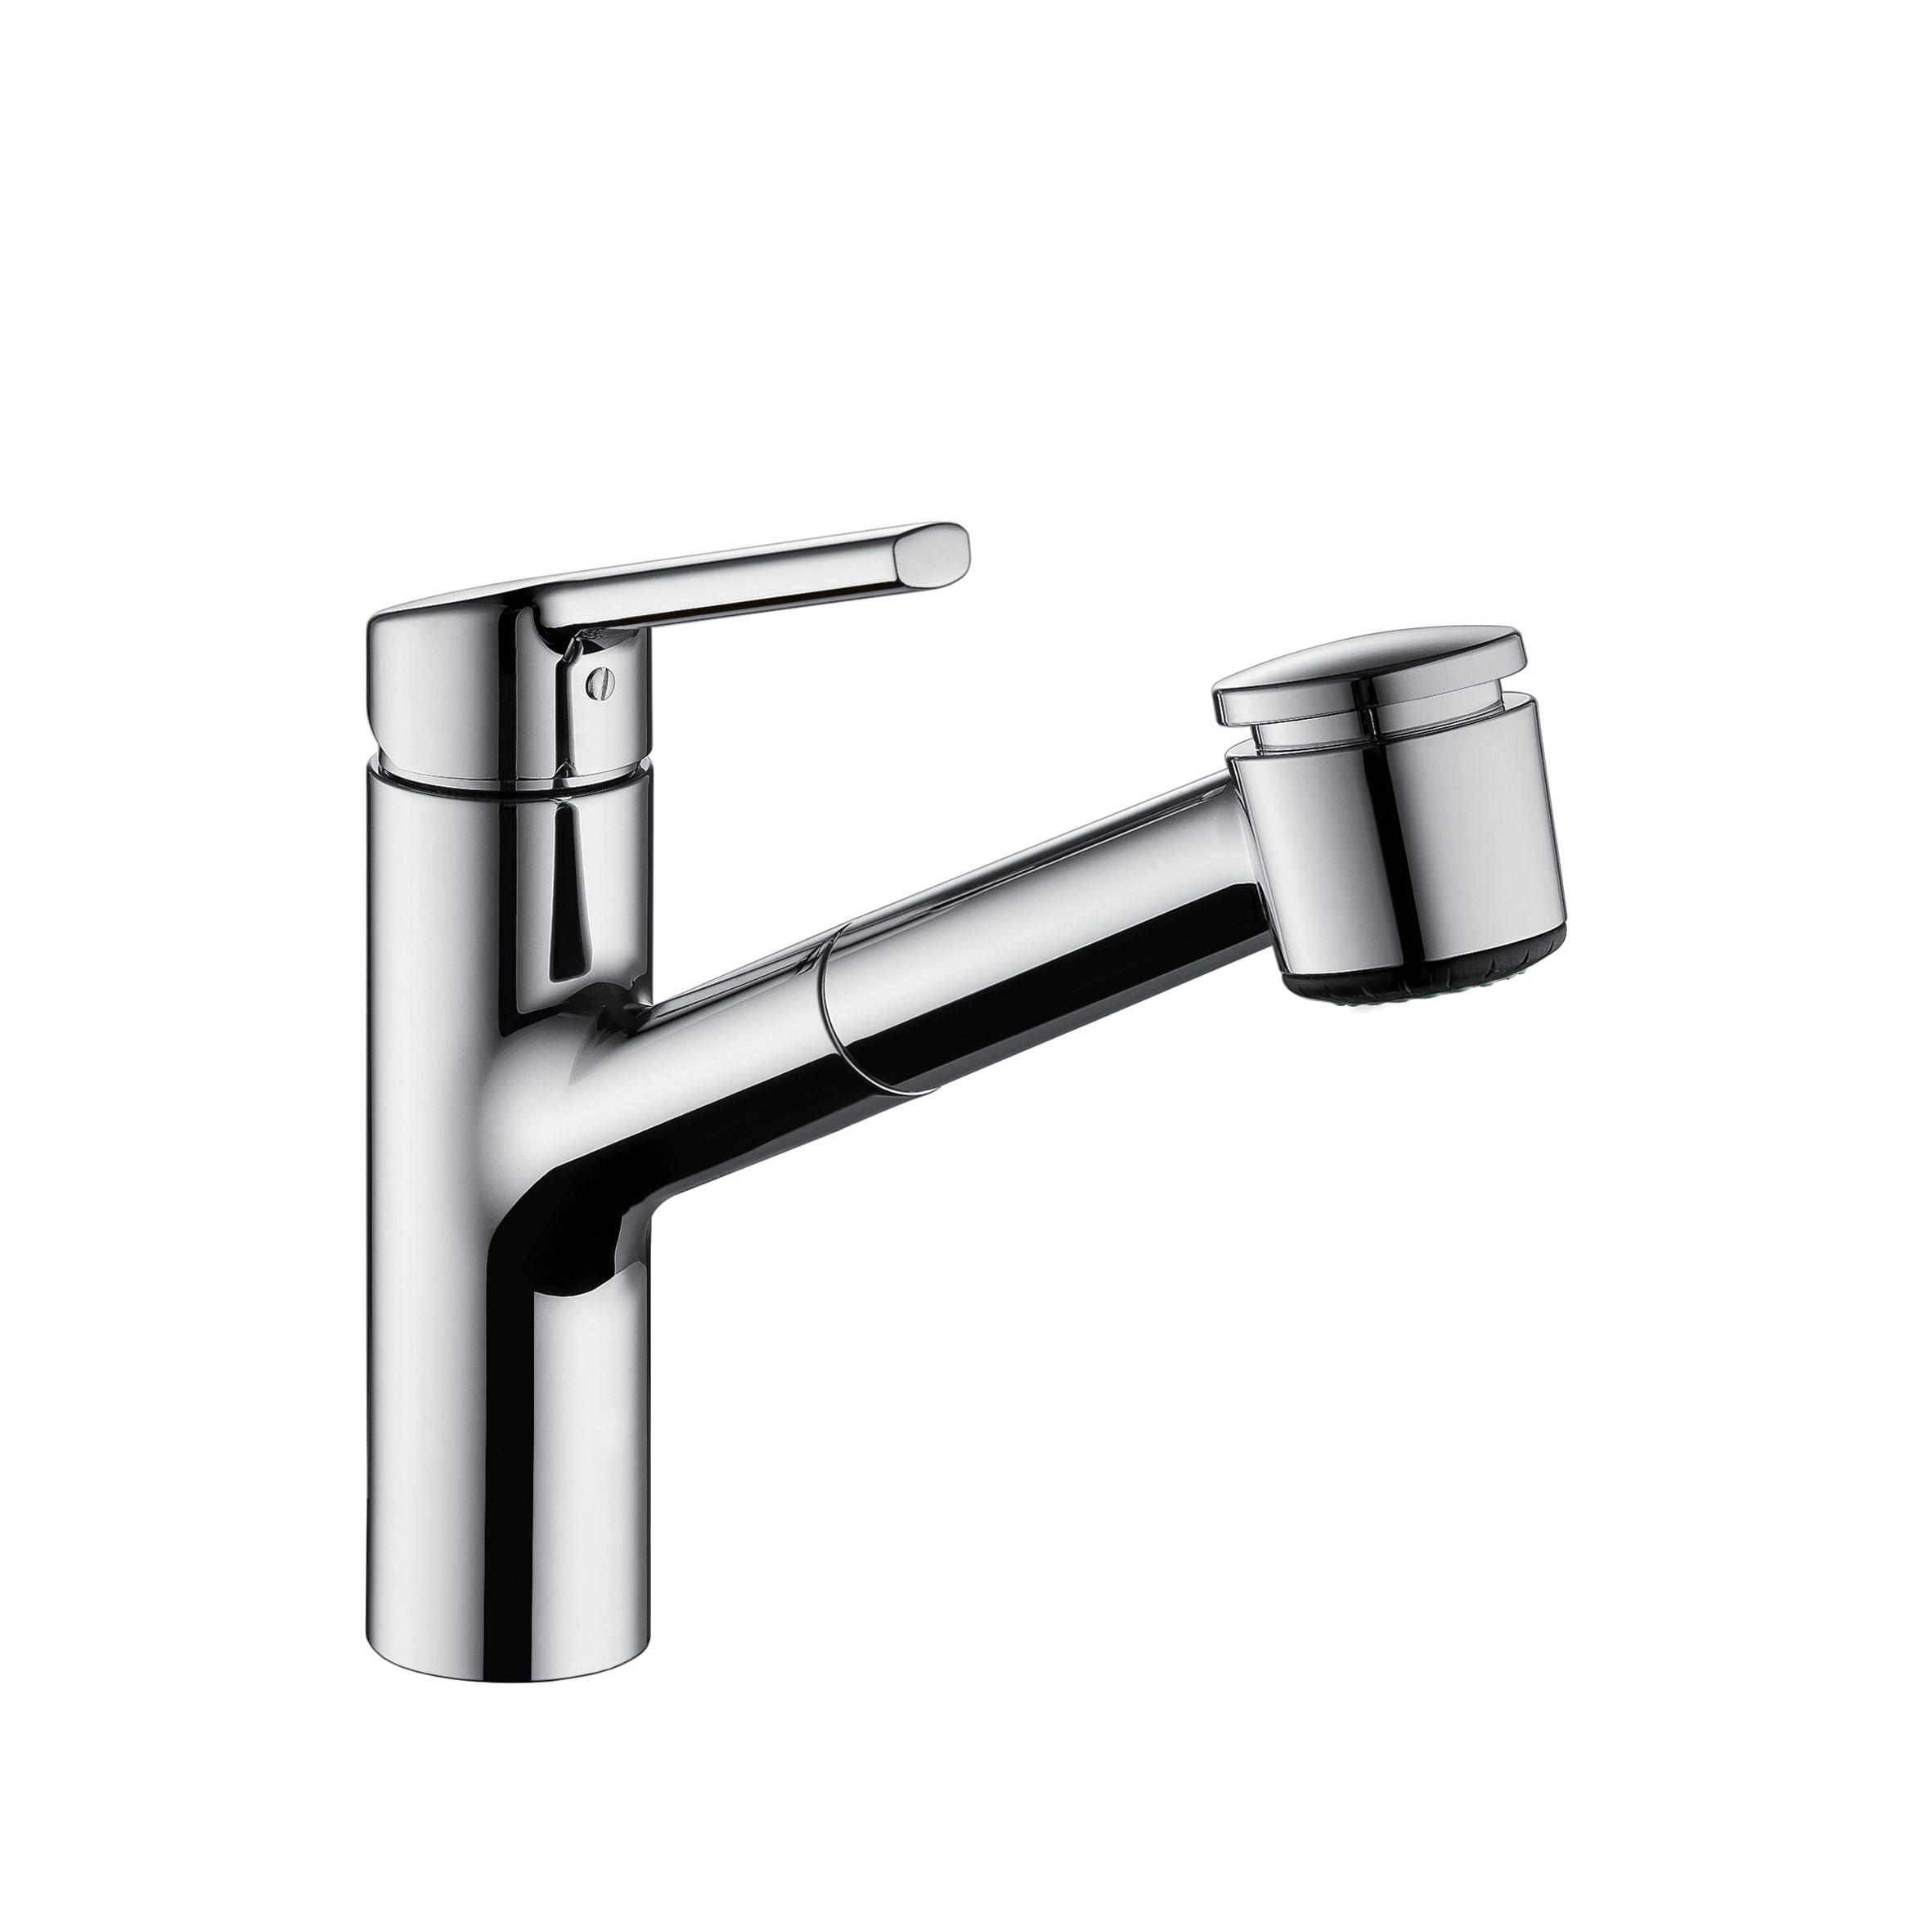 faucets single kwc of faucet black best lovely furniture com bathrooms hole bathroom sink design indusperformance side